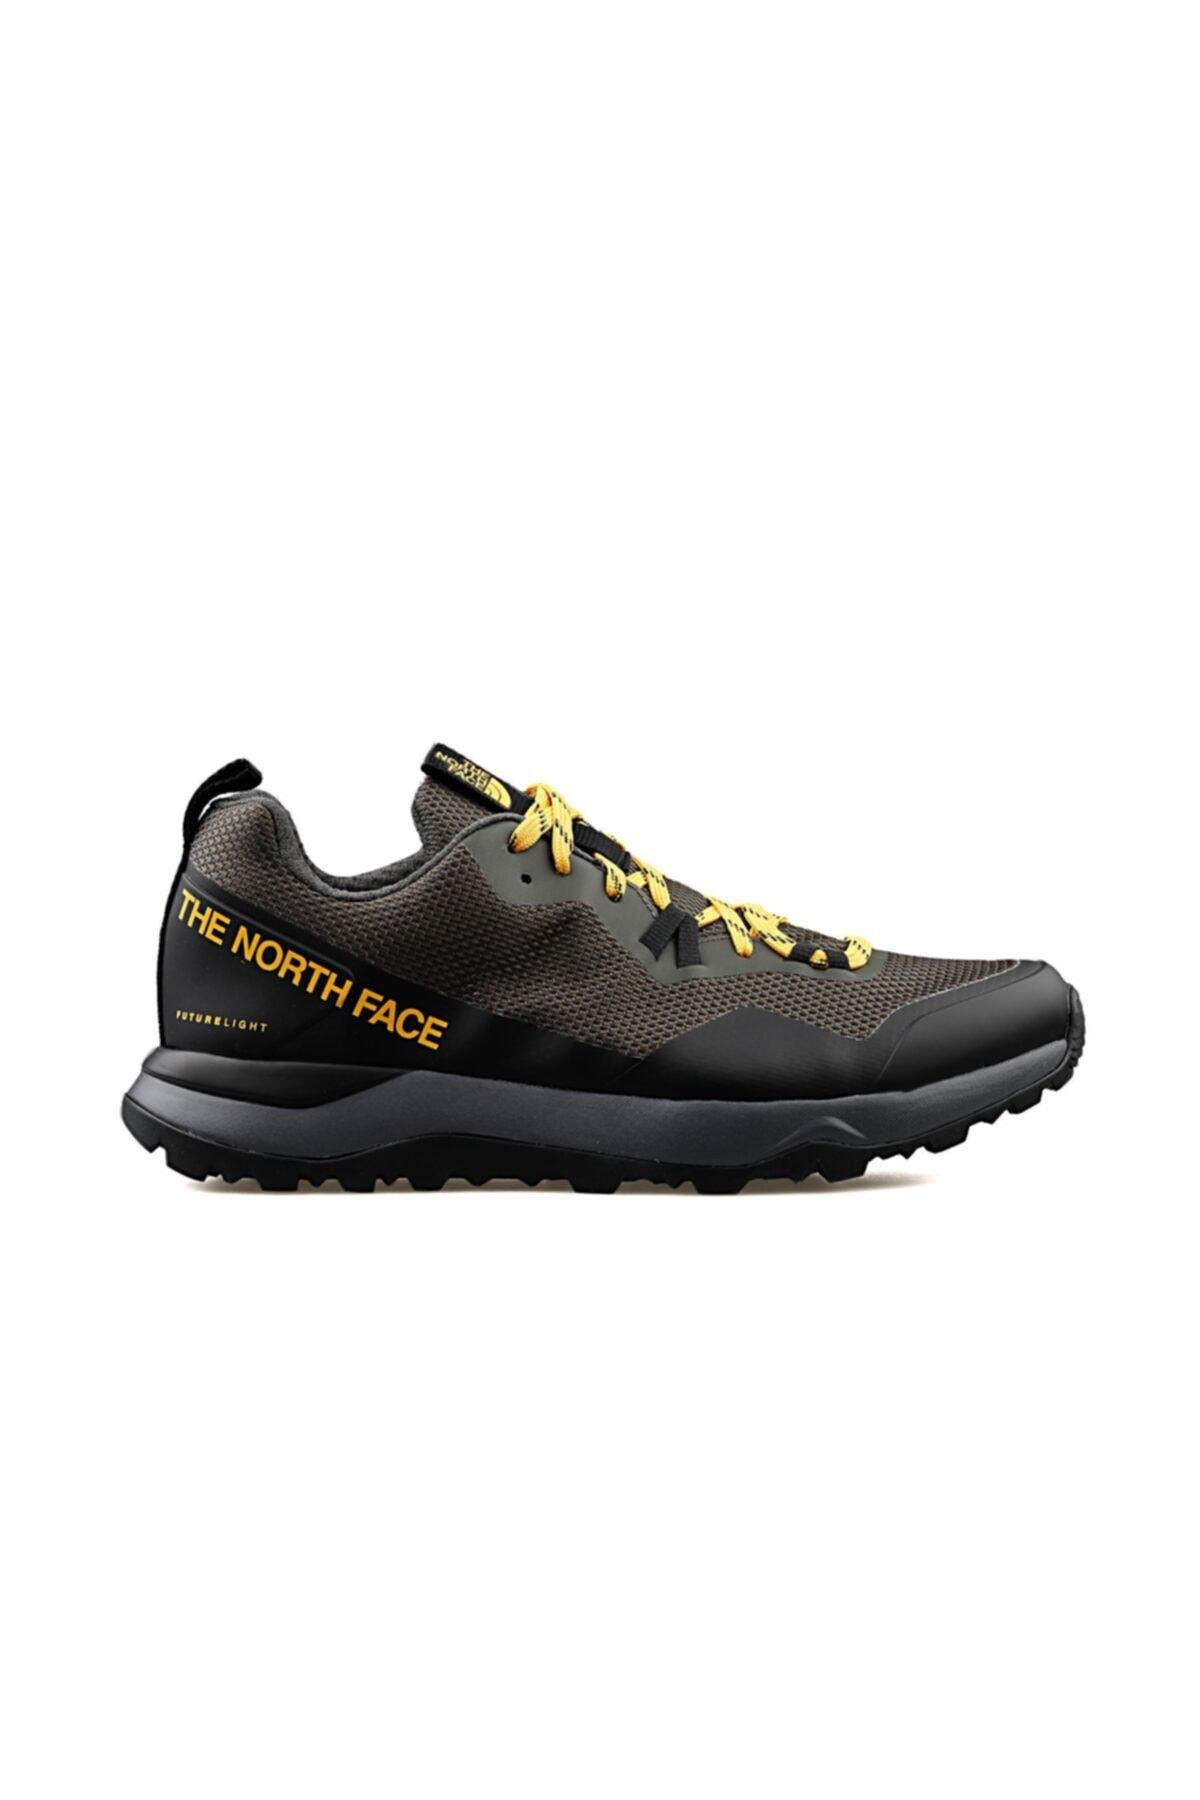 THE NORTH FACE Erkek Siyah  Nf0a3yupbqw1 M Actıvıst Futrlıght Outdoor  Ayakkabı 1